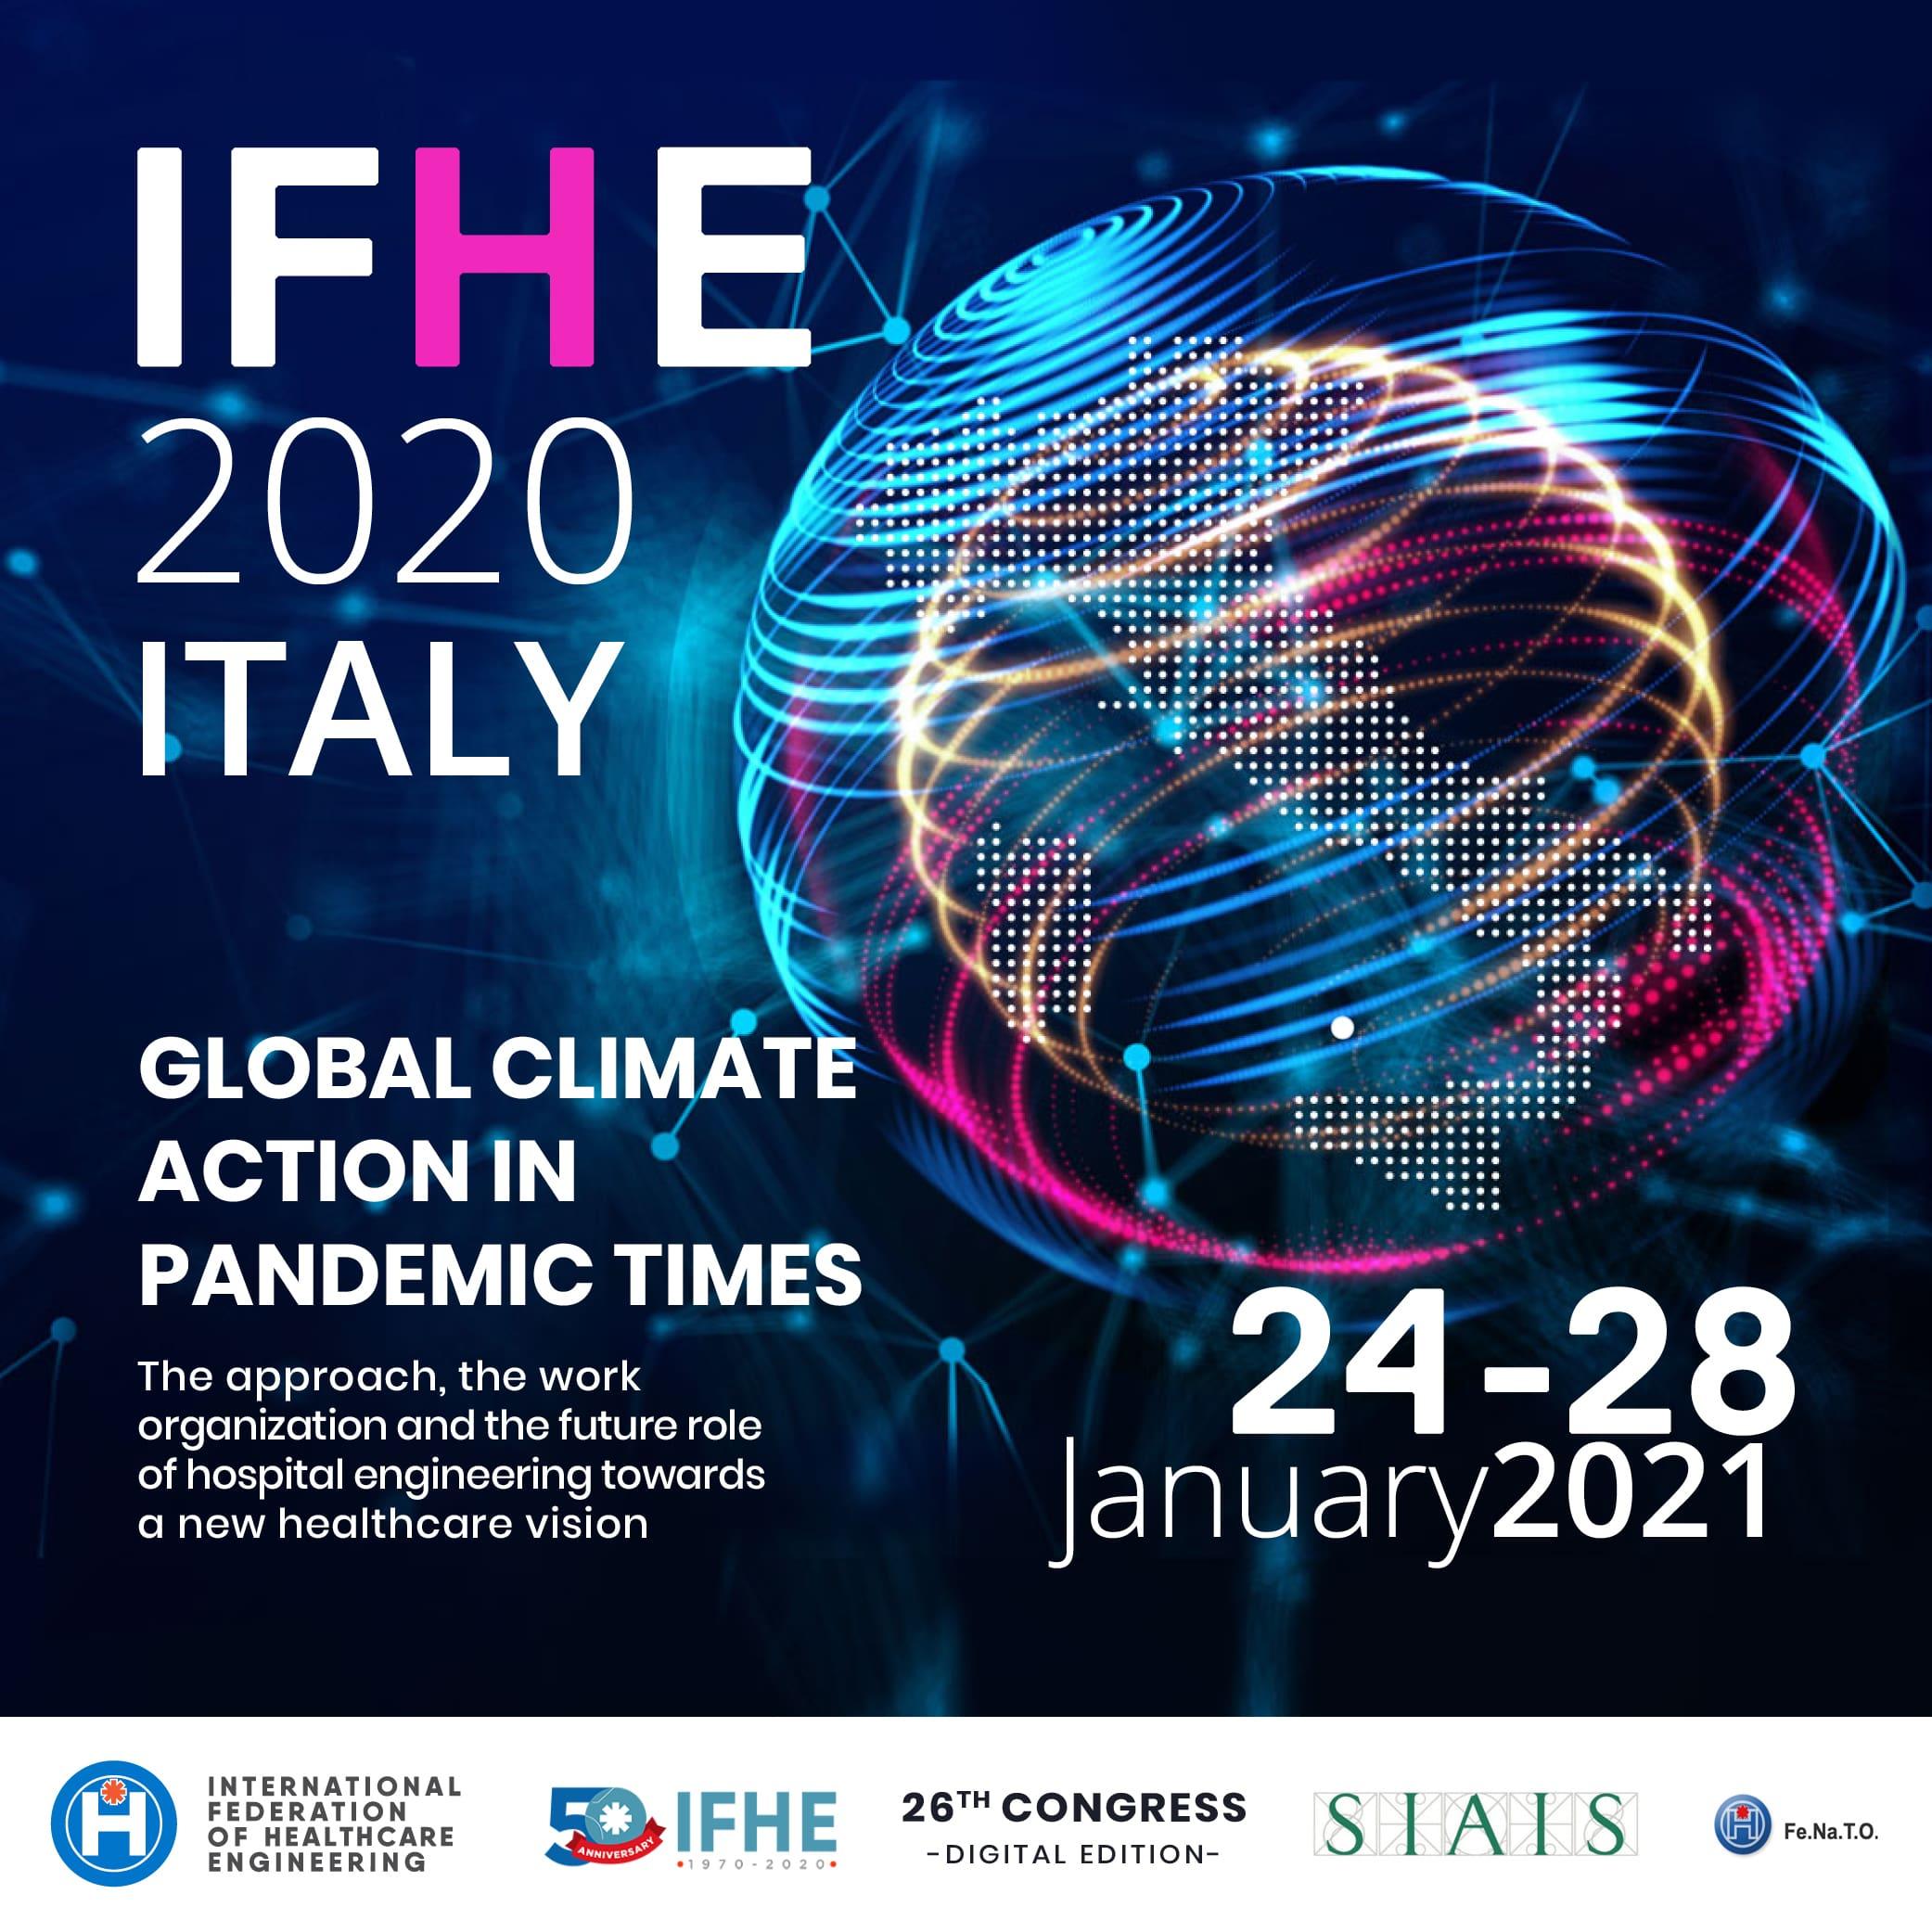 IFHE 2020 Italia – Edición digital 2021